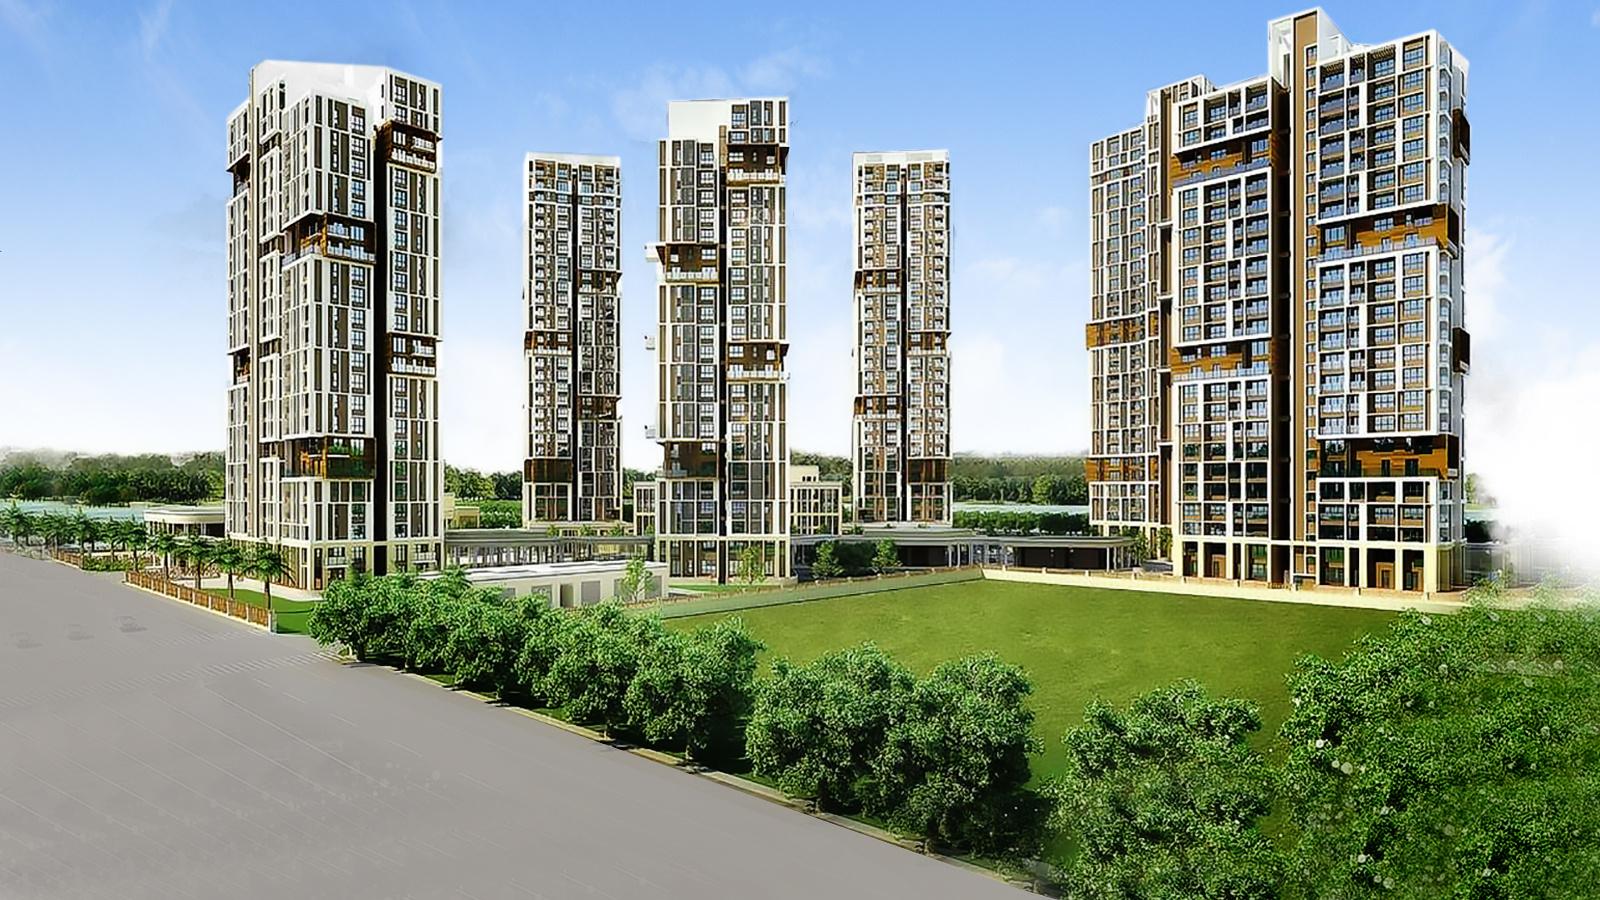 3, 4 BHK Cluster Plan Image - TATA Housing Development ...